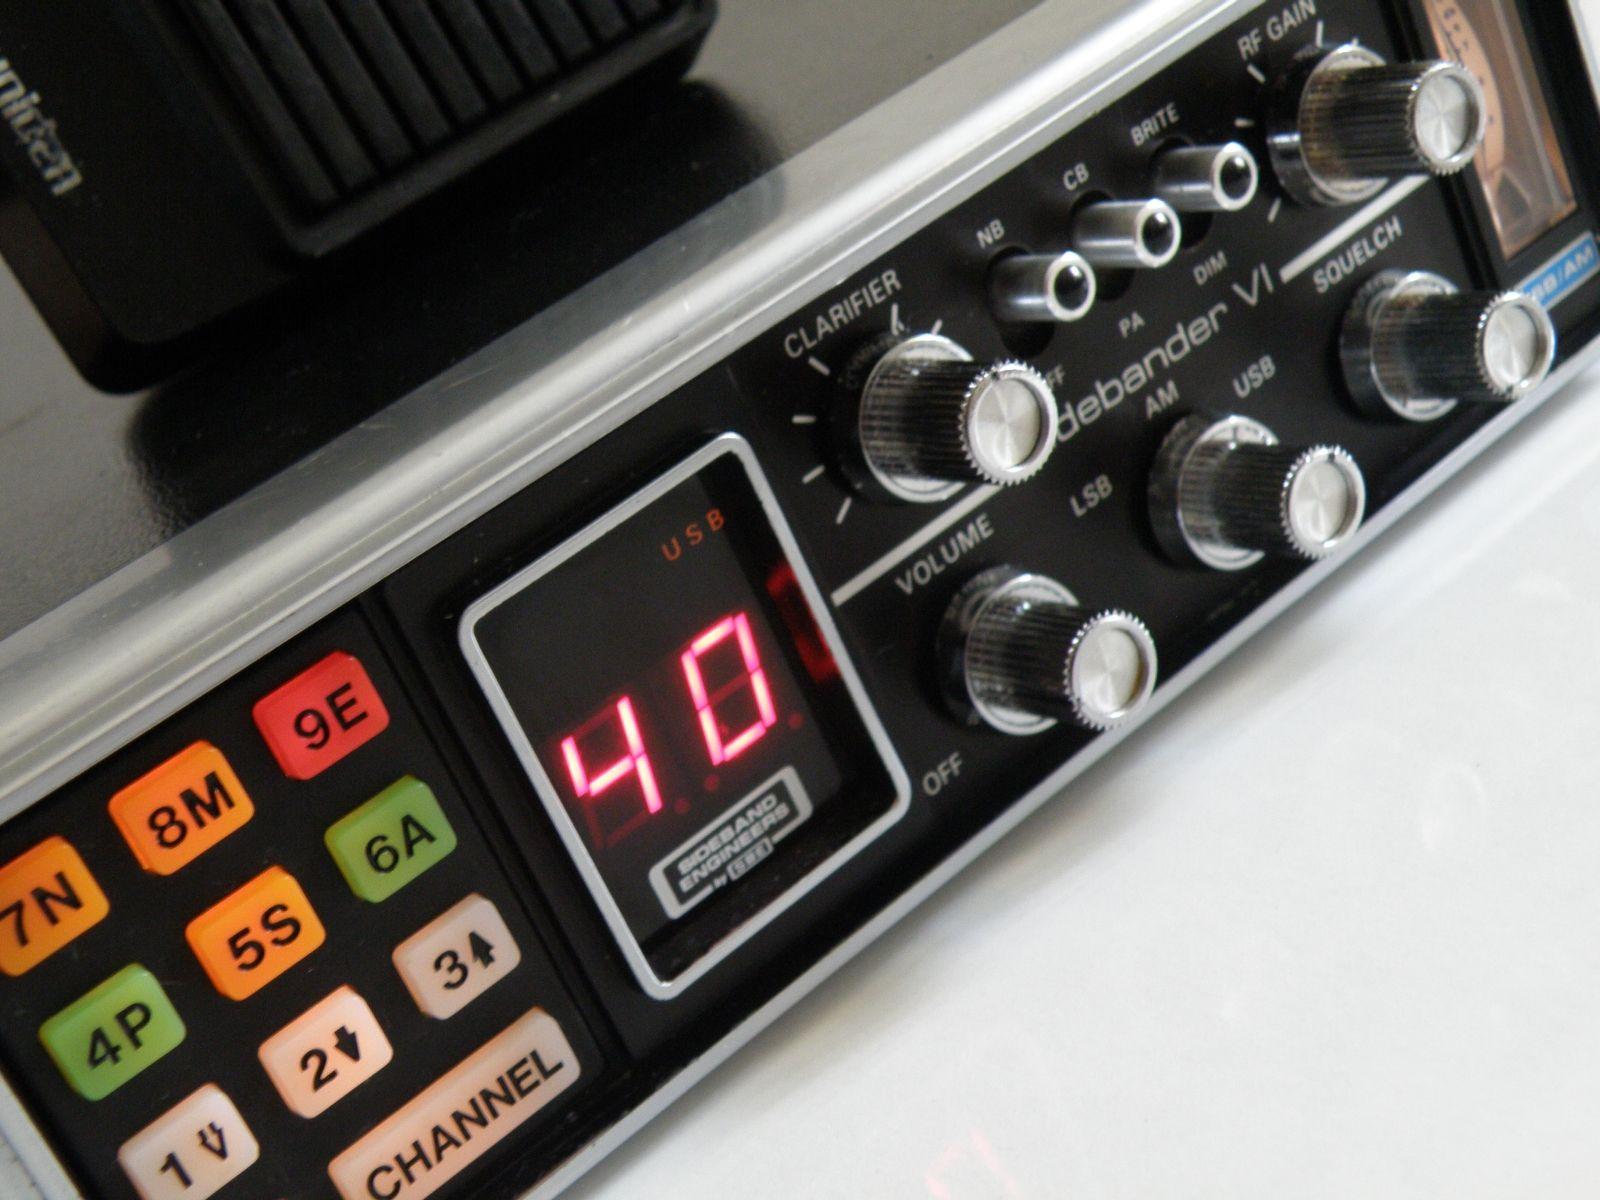 Sbe Sidebander Vi 40 Channel Hf Cb Radio Radios 27mhz Am Lsb Receiver Circuit